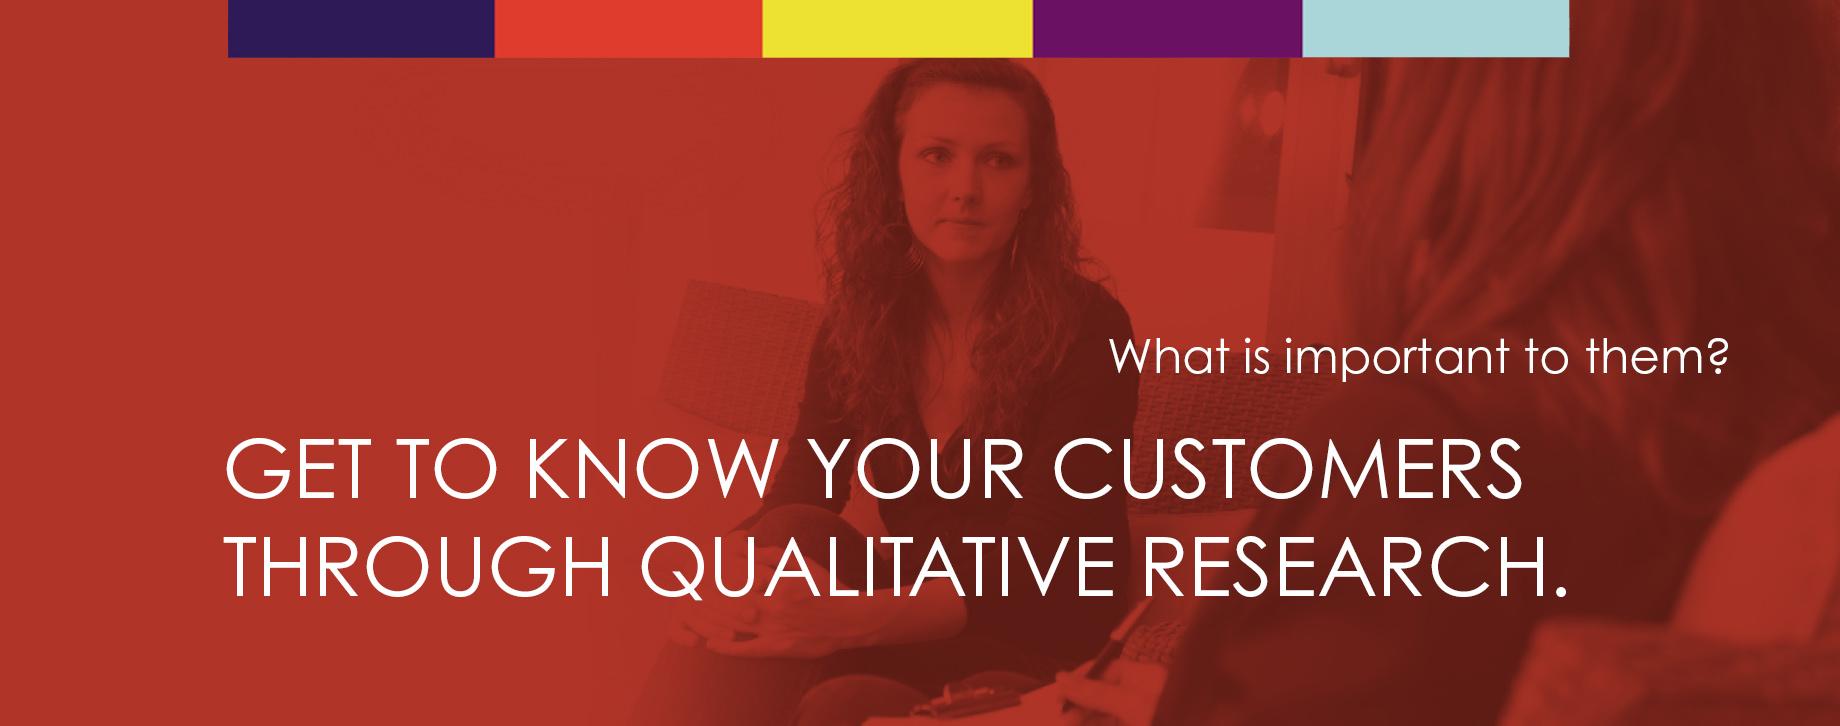 Clift Focus Group Moderator - Qualitative Research 04.jpg